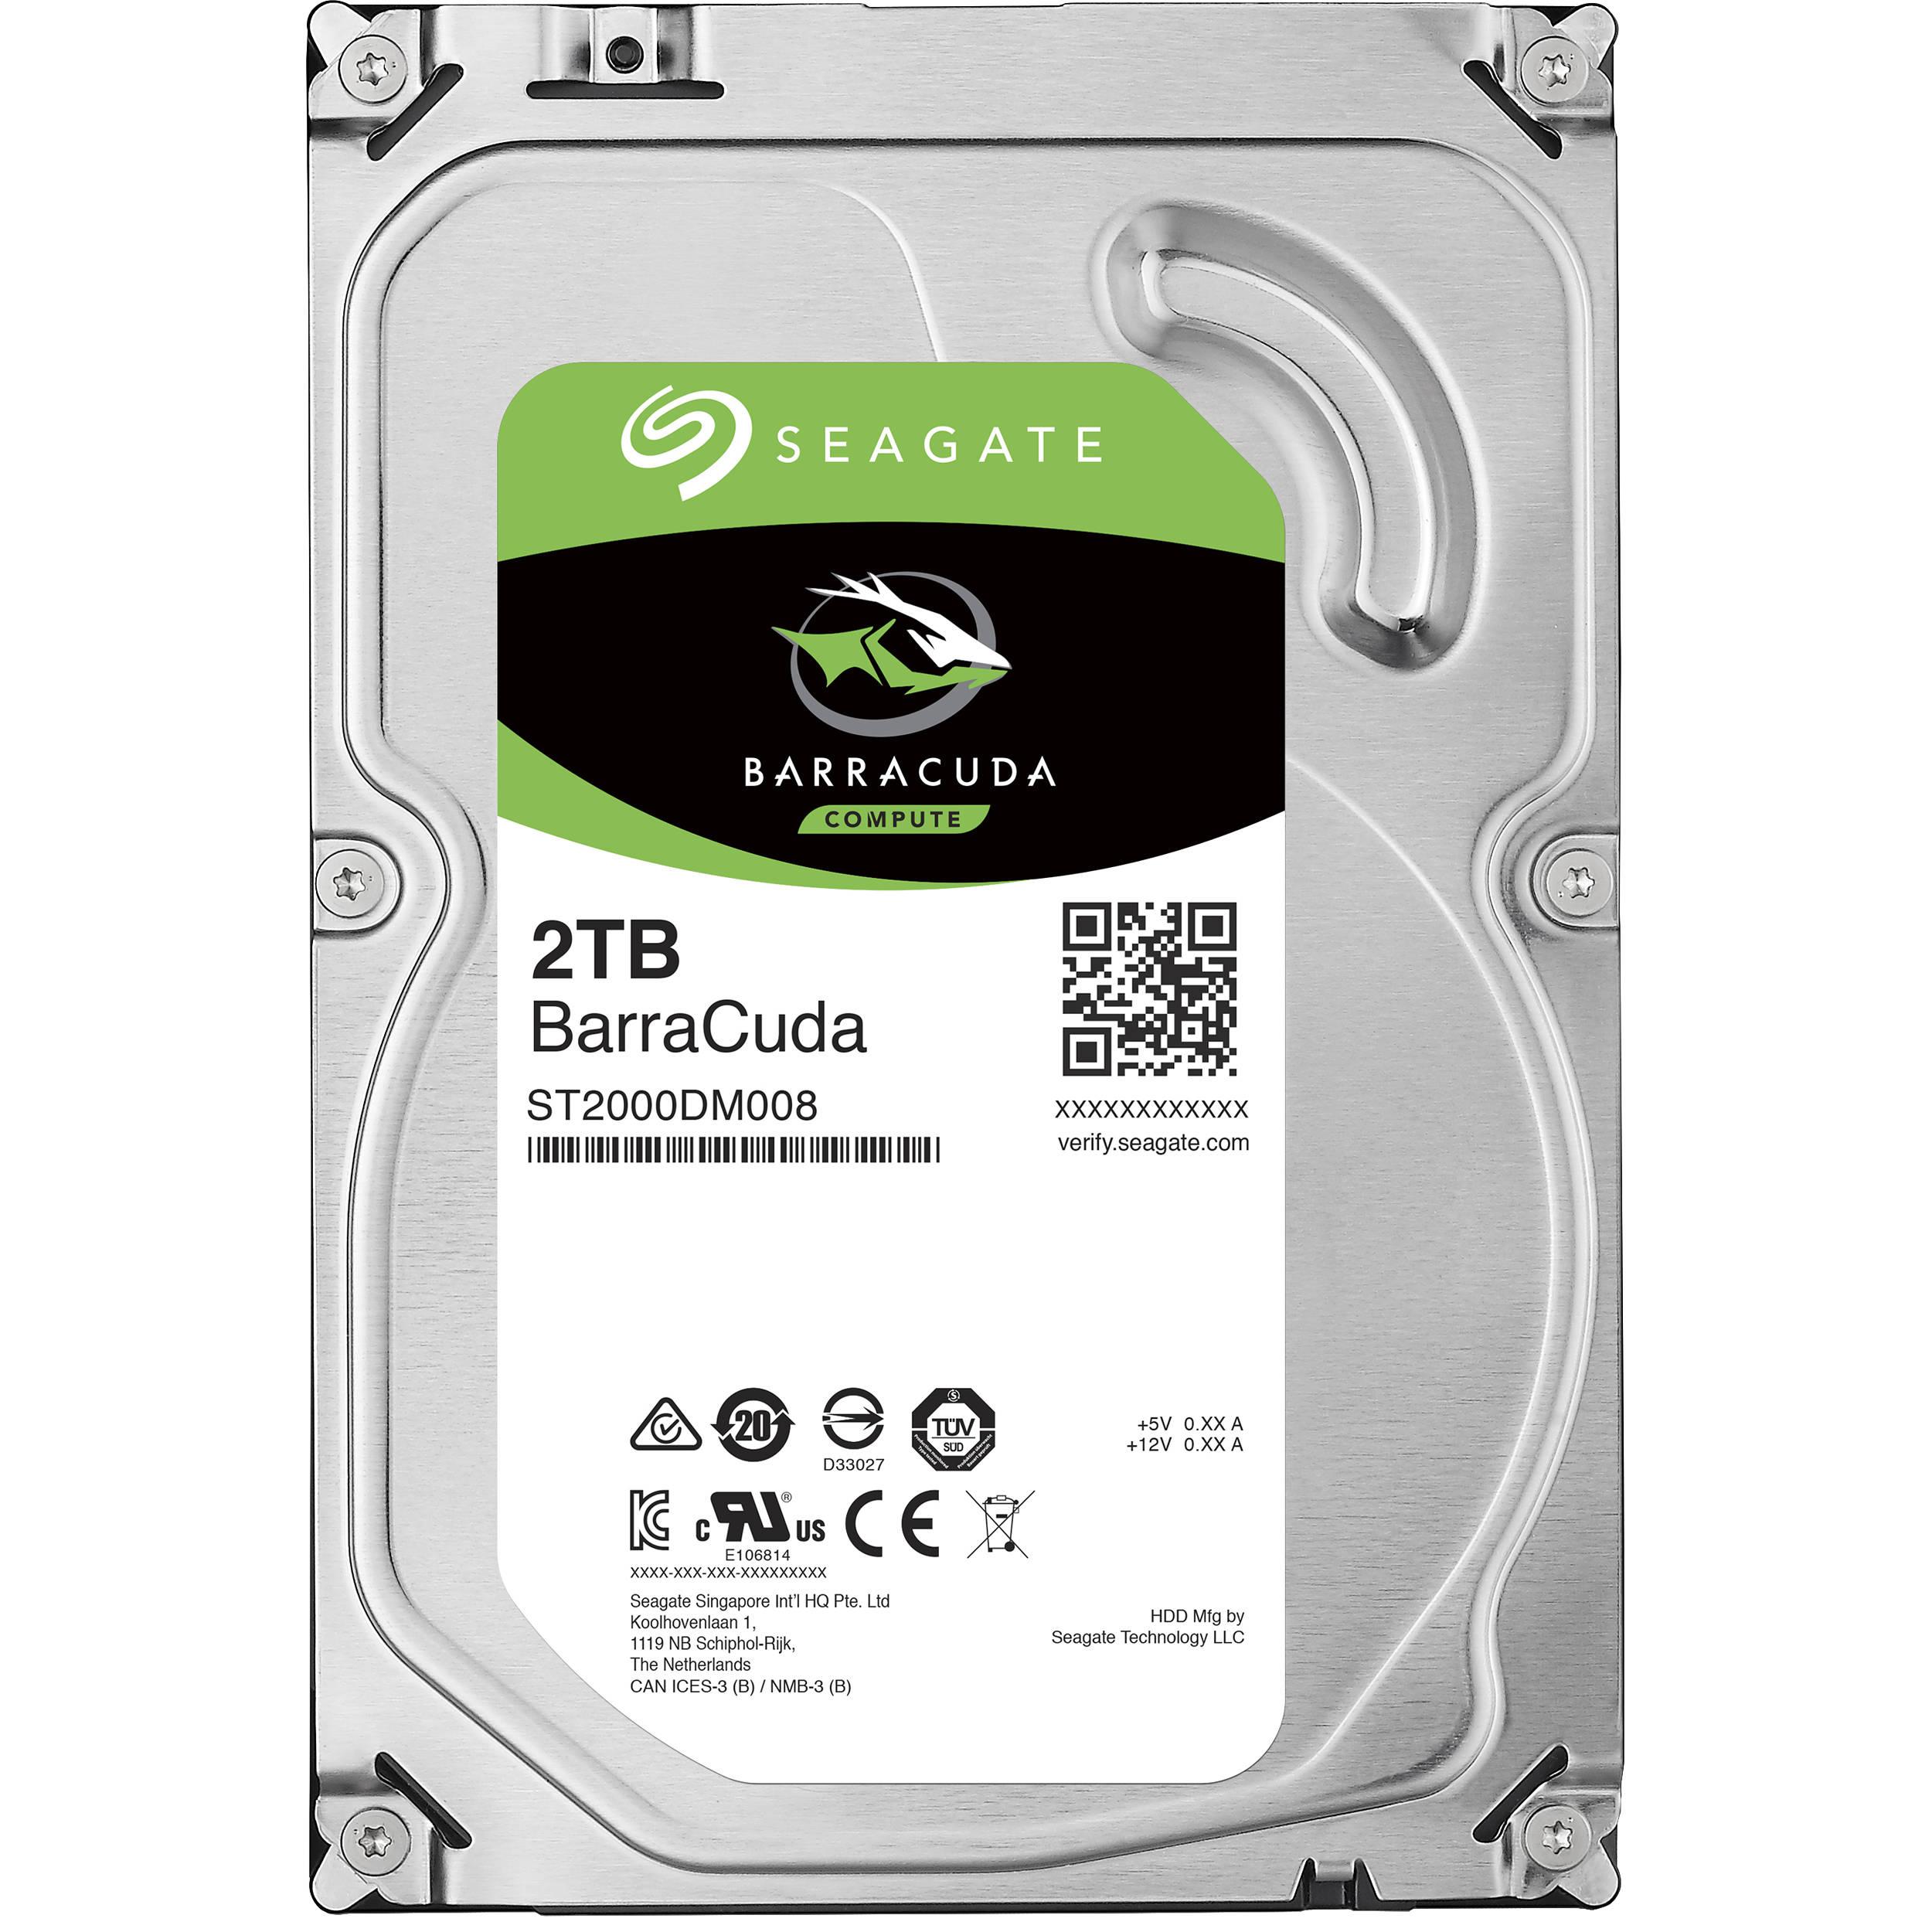 SEAGATE Desktop HDD BARRACUDA 1TB hard drive SATA INTERNAL 7200 RPM